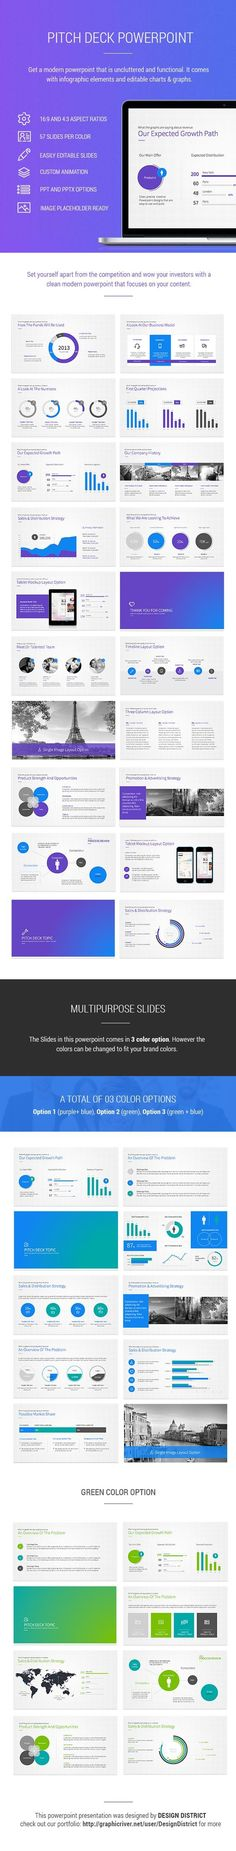 Inspiration, Infografik, Diagramme, Grafiken, Informationsvermittlung, Farbkombination